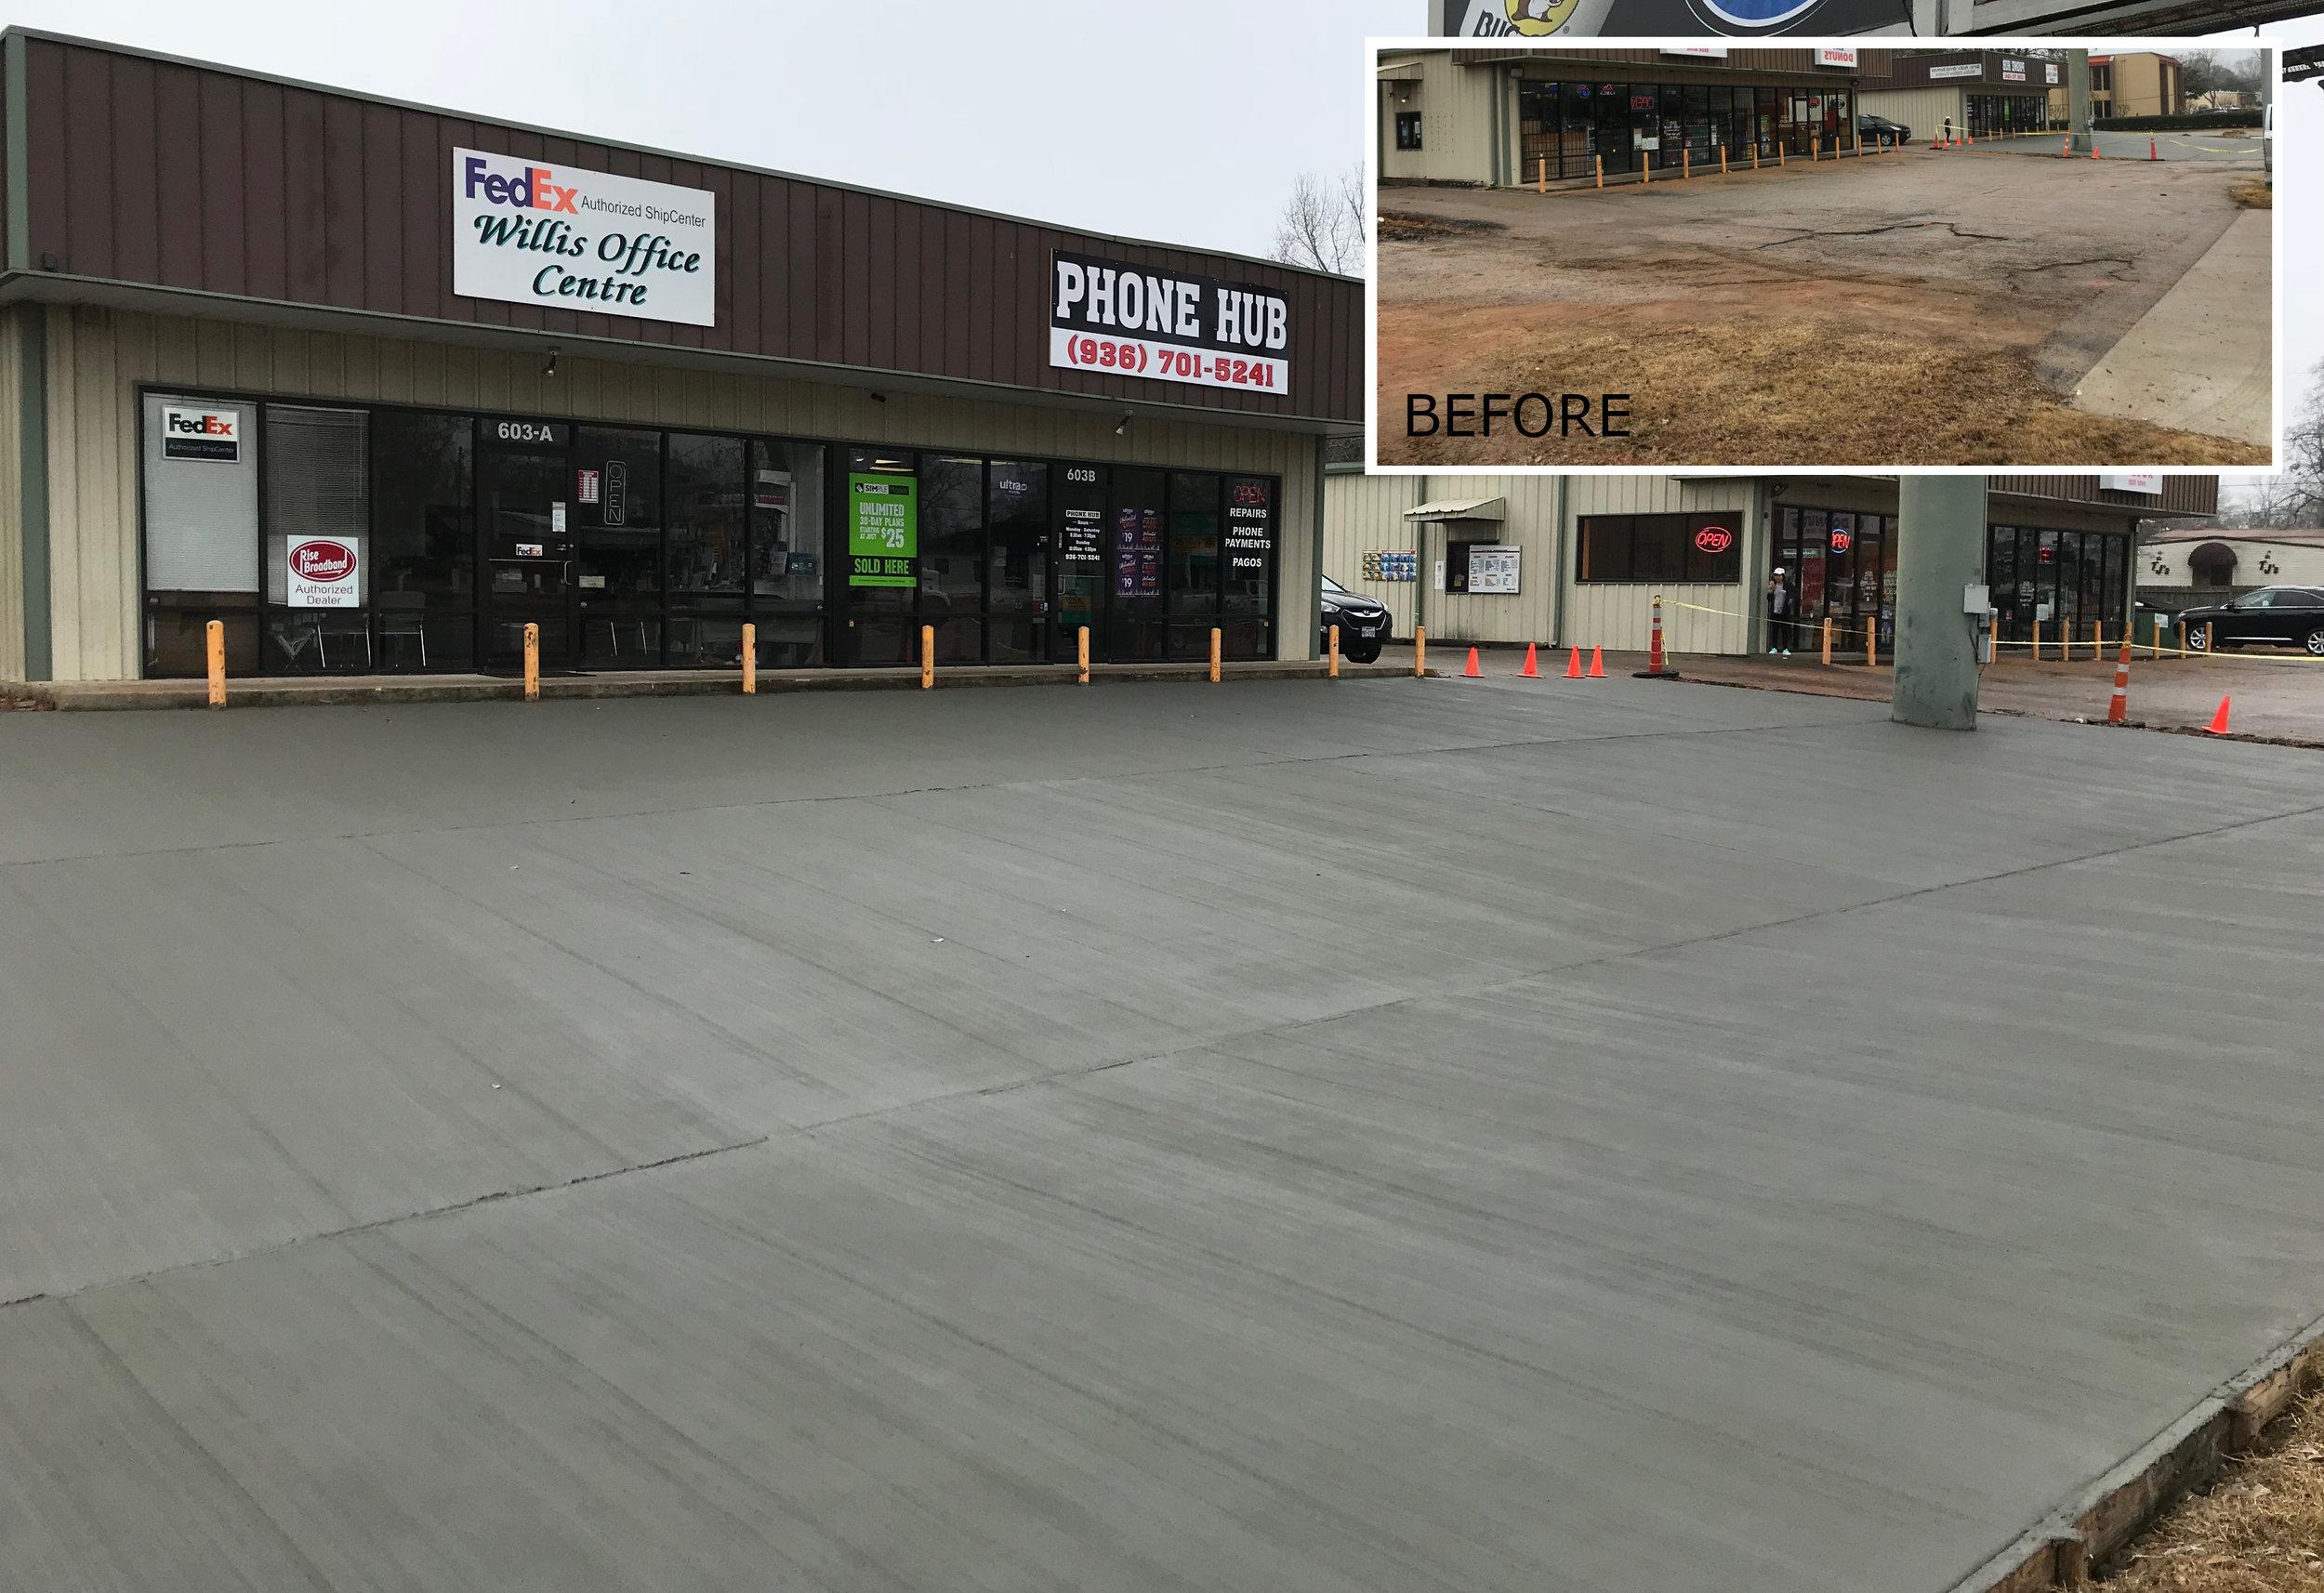 Parking Lots - (Image: Concrete parking lot, before & after)